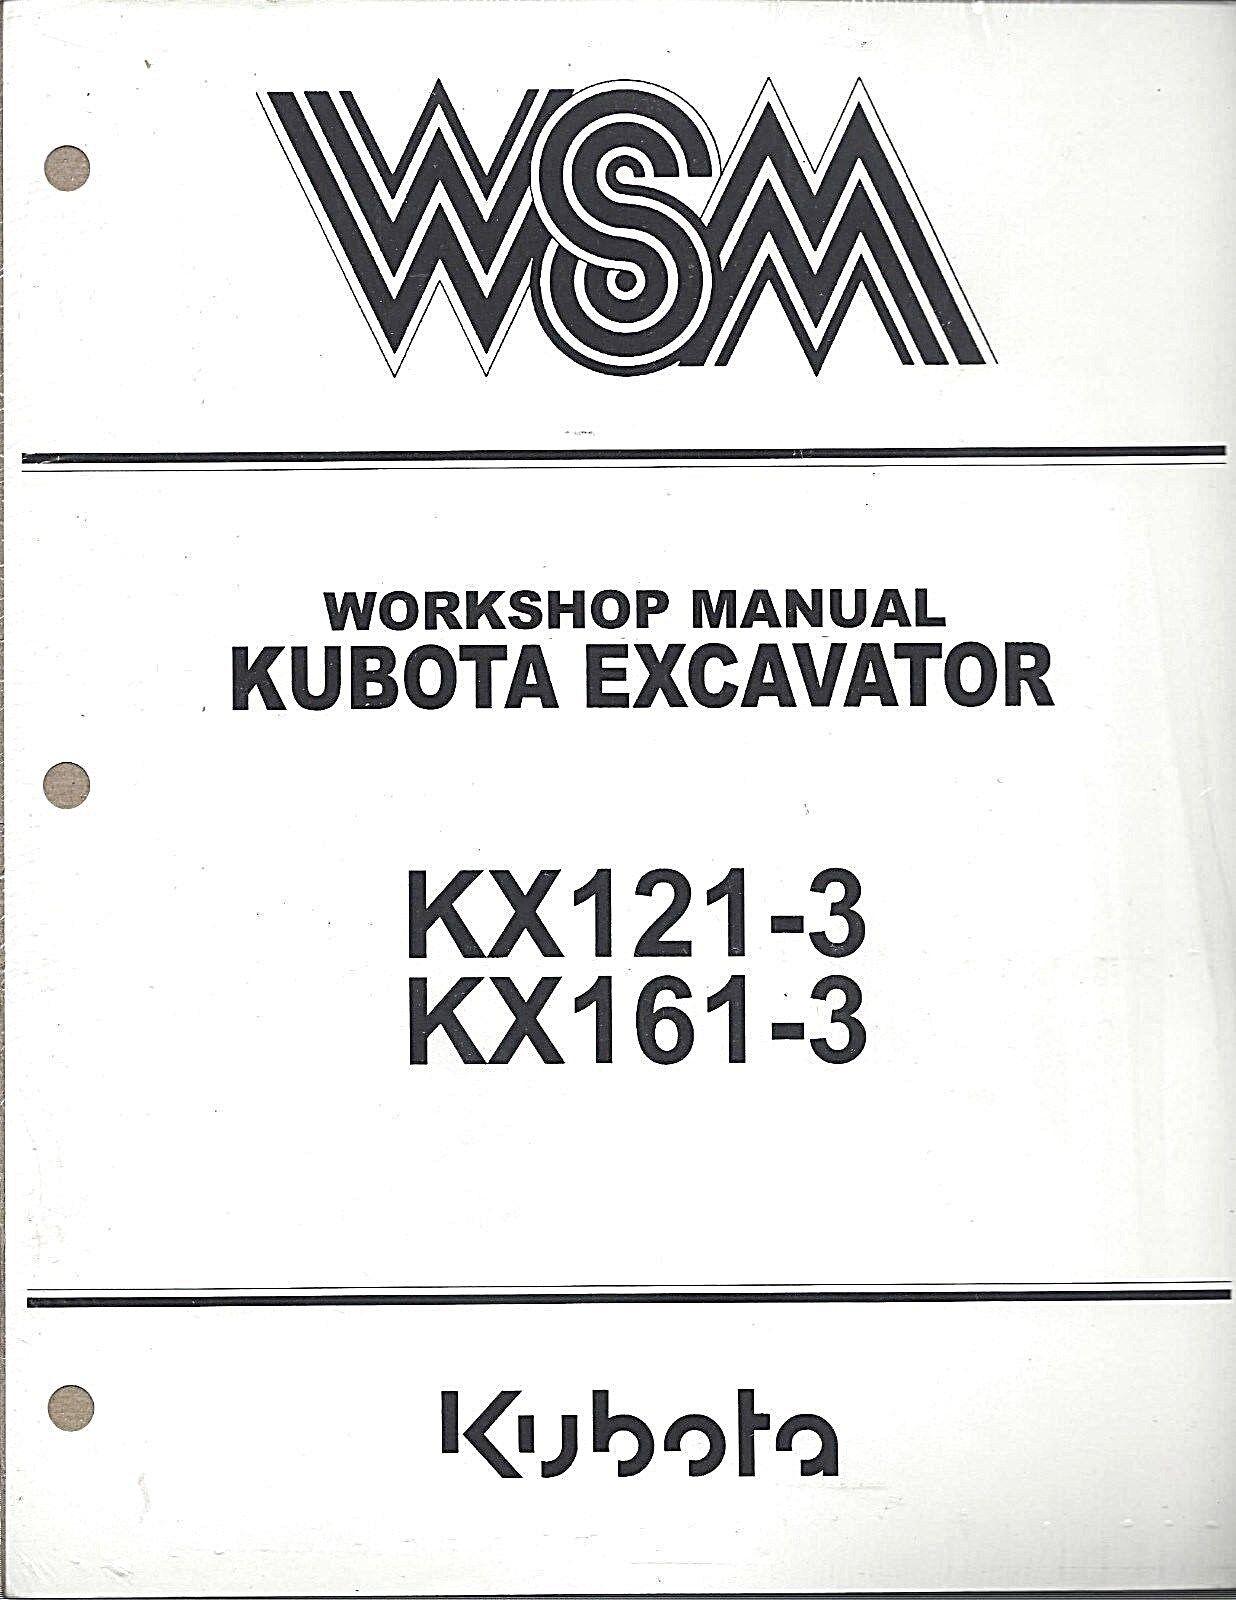 [DVZP_7254]   300F0A Kubota Excavator Kx Owner S Manuals | Wiring Library | Kubota Excavator Wiring Diagrams |  | Wiring Library